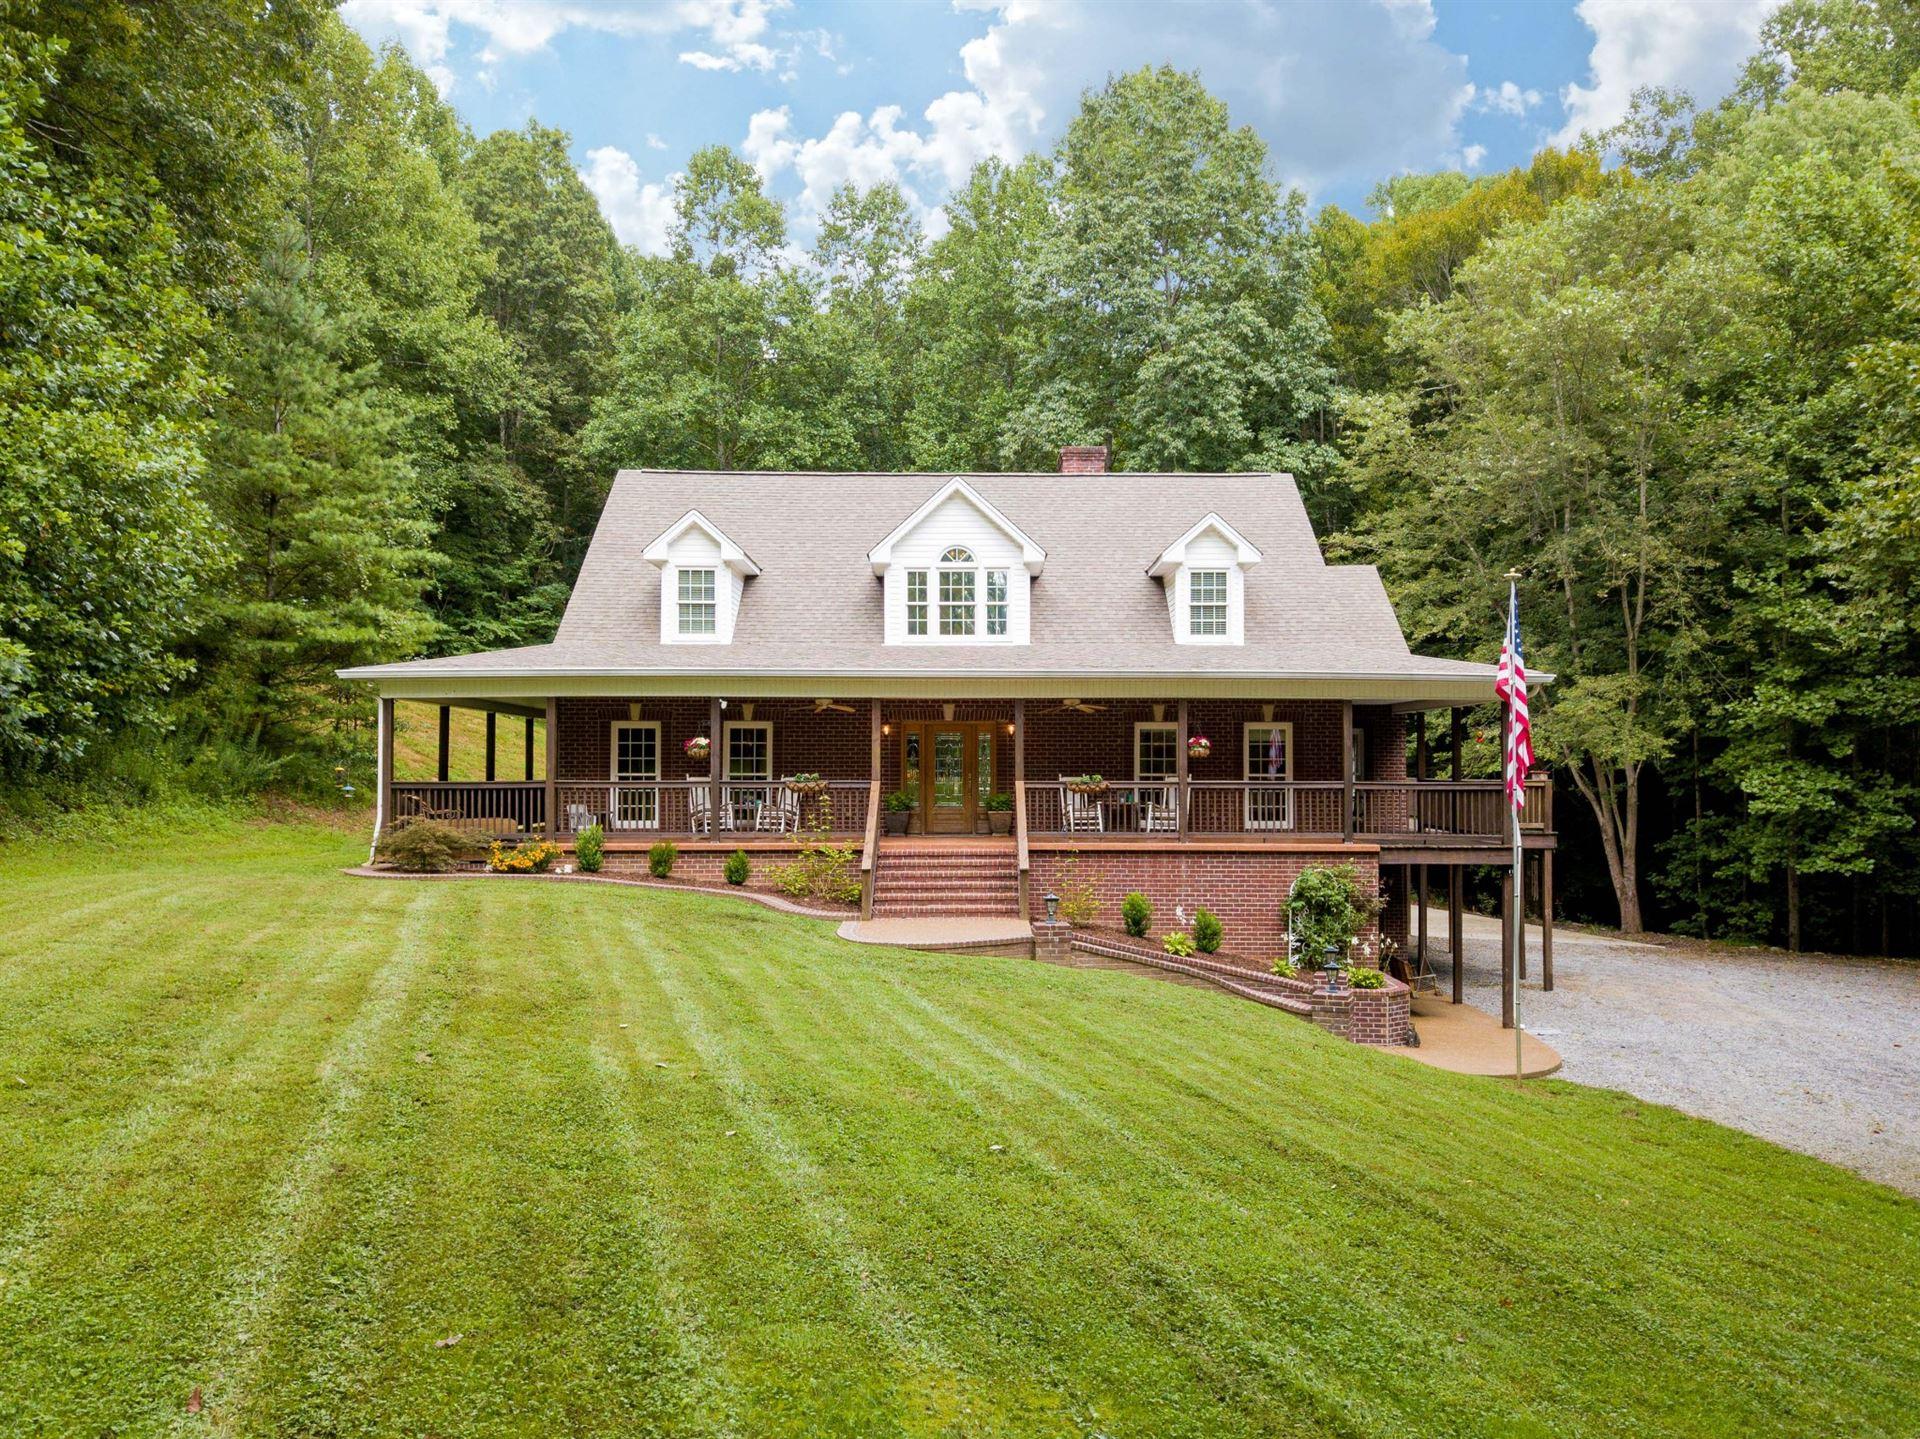 1434 Butler Mill Hollow Rd, Bethpage, TN 37022 - MLS#: 2227077